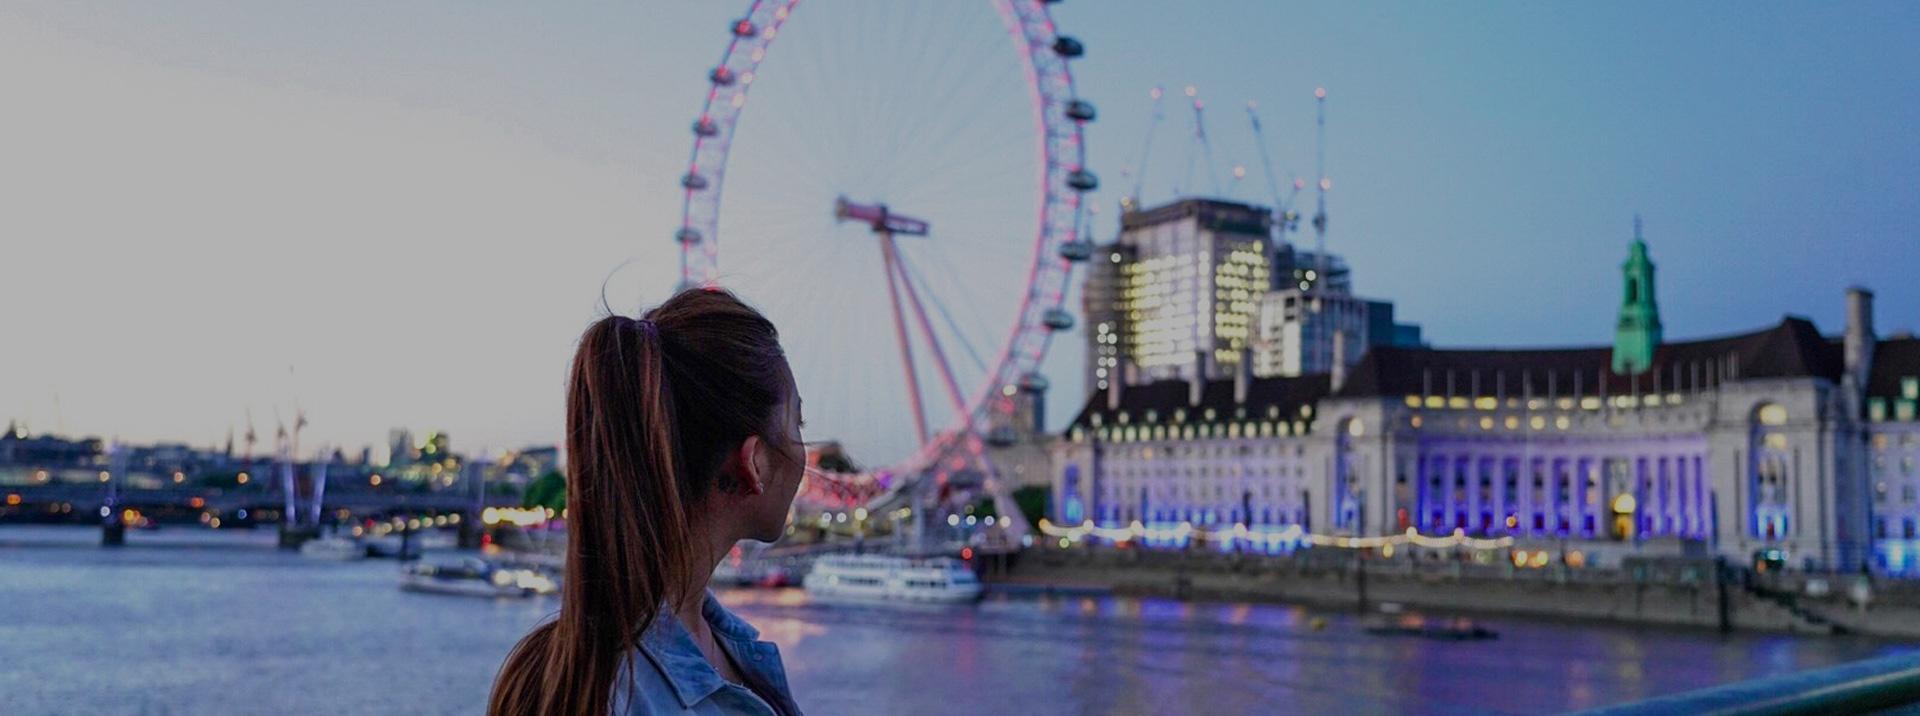 London Intern Looking at London Eye